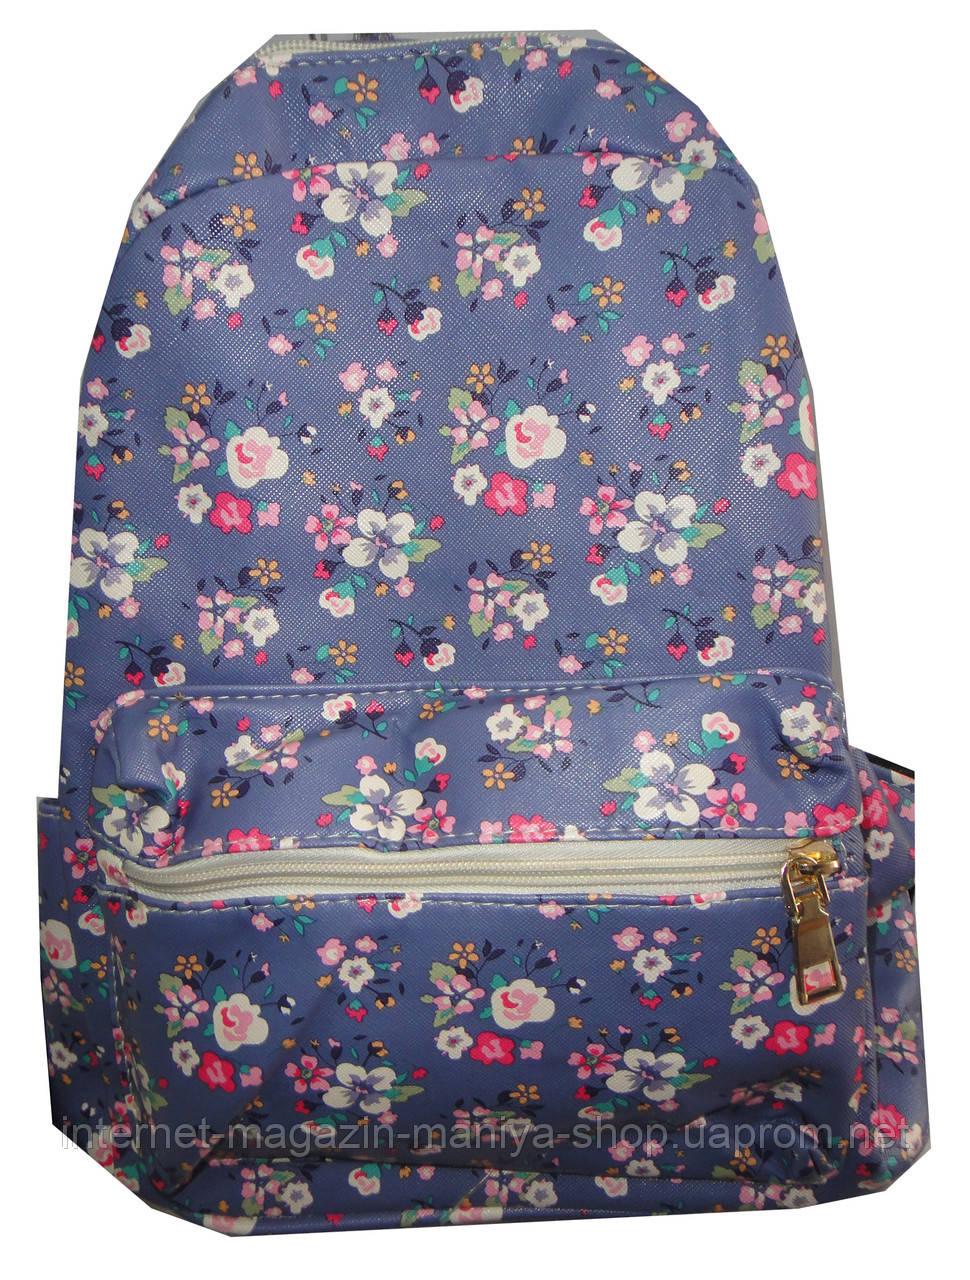 Рюкзак для девочки H008 цветы карман